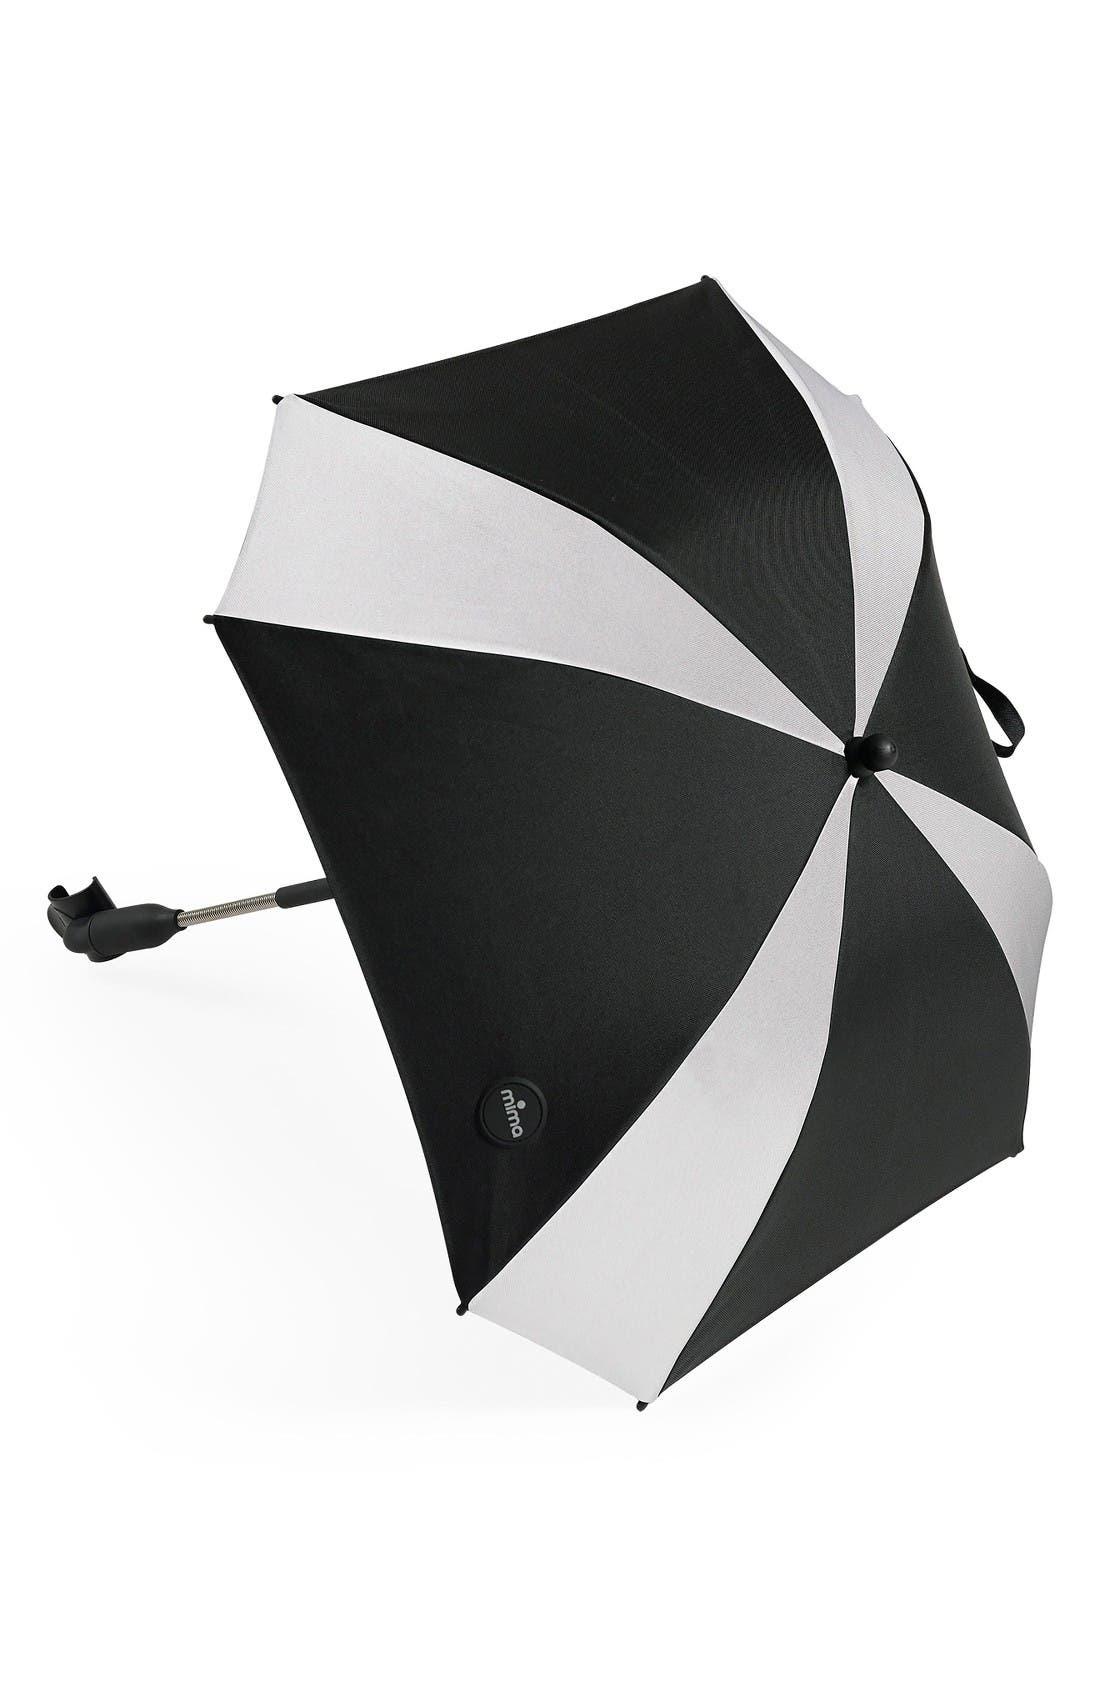 Alternate Image 1 Selected - Mima Stroller Umbrella